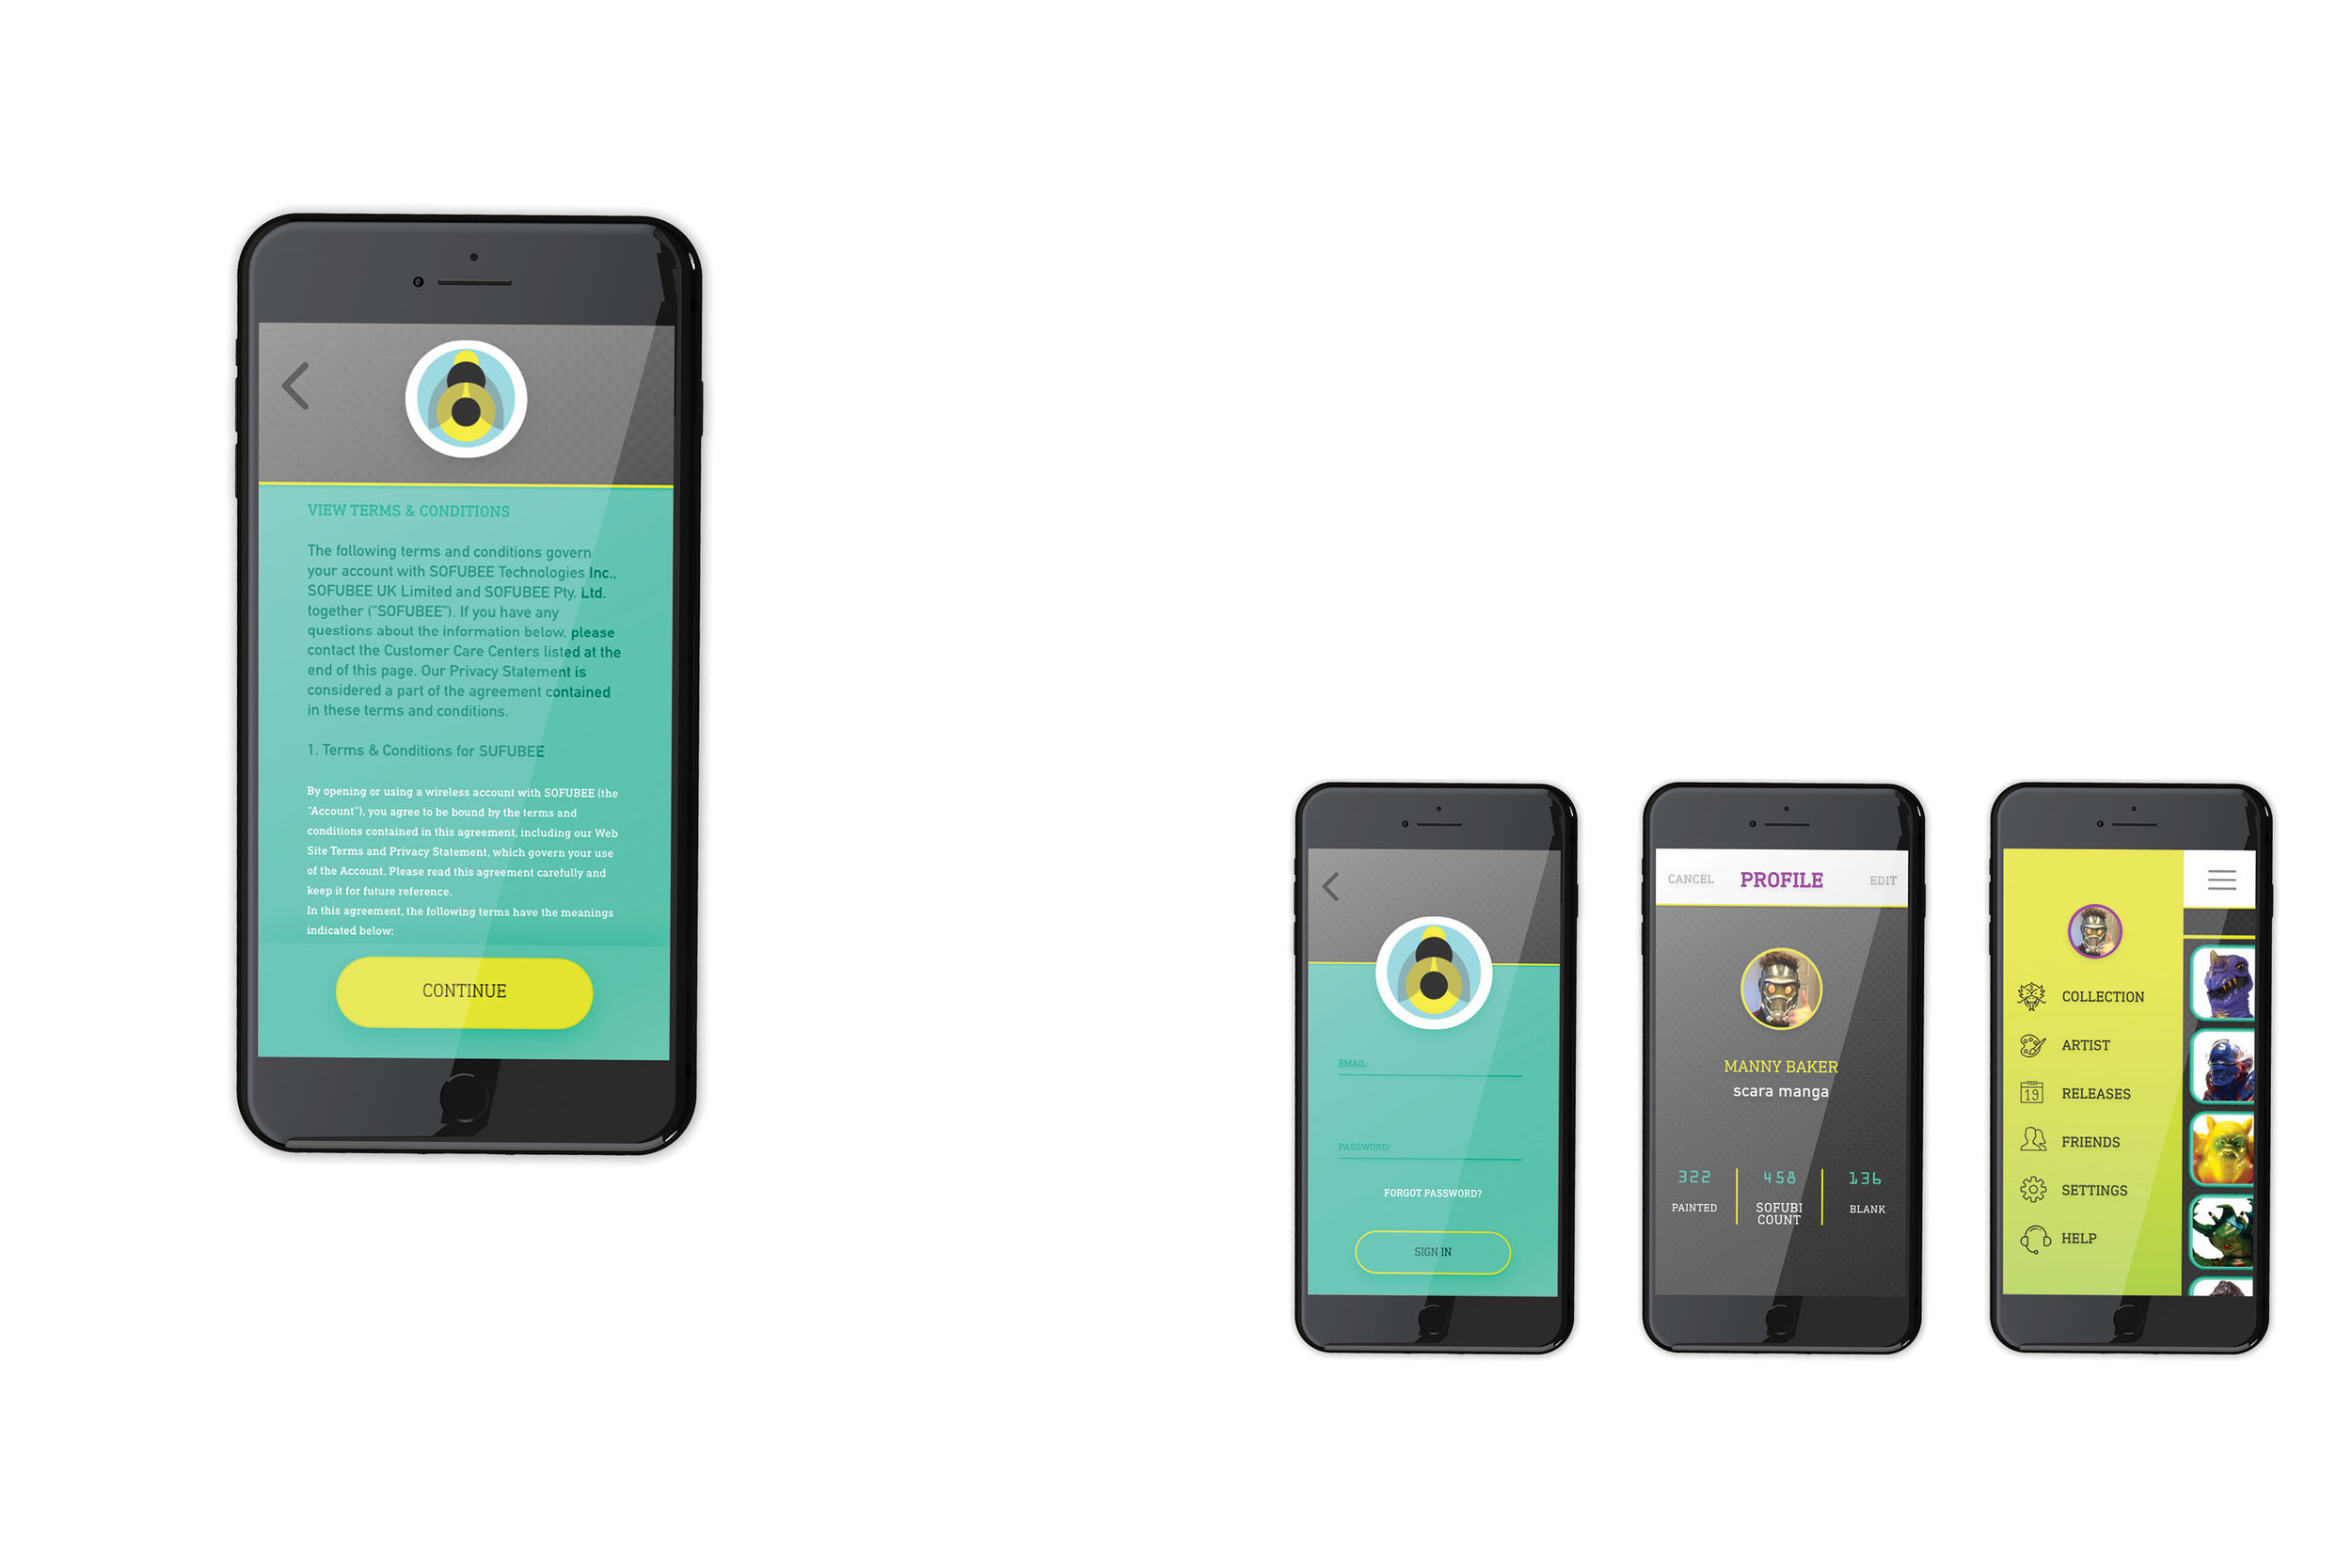 phone_app5.jpg